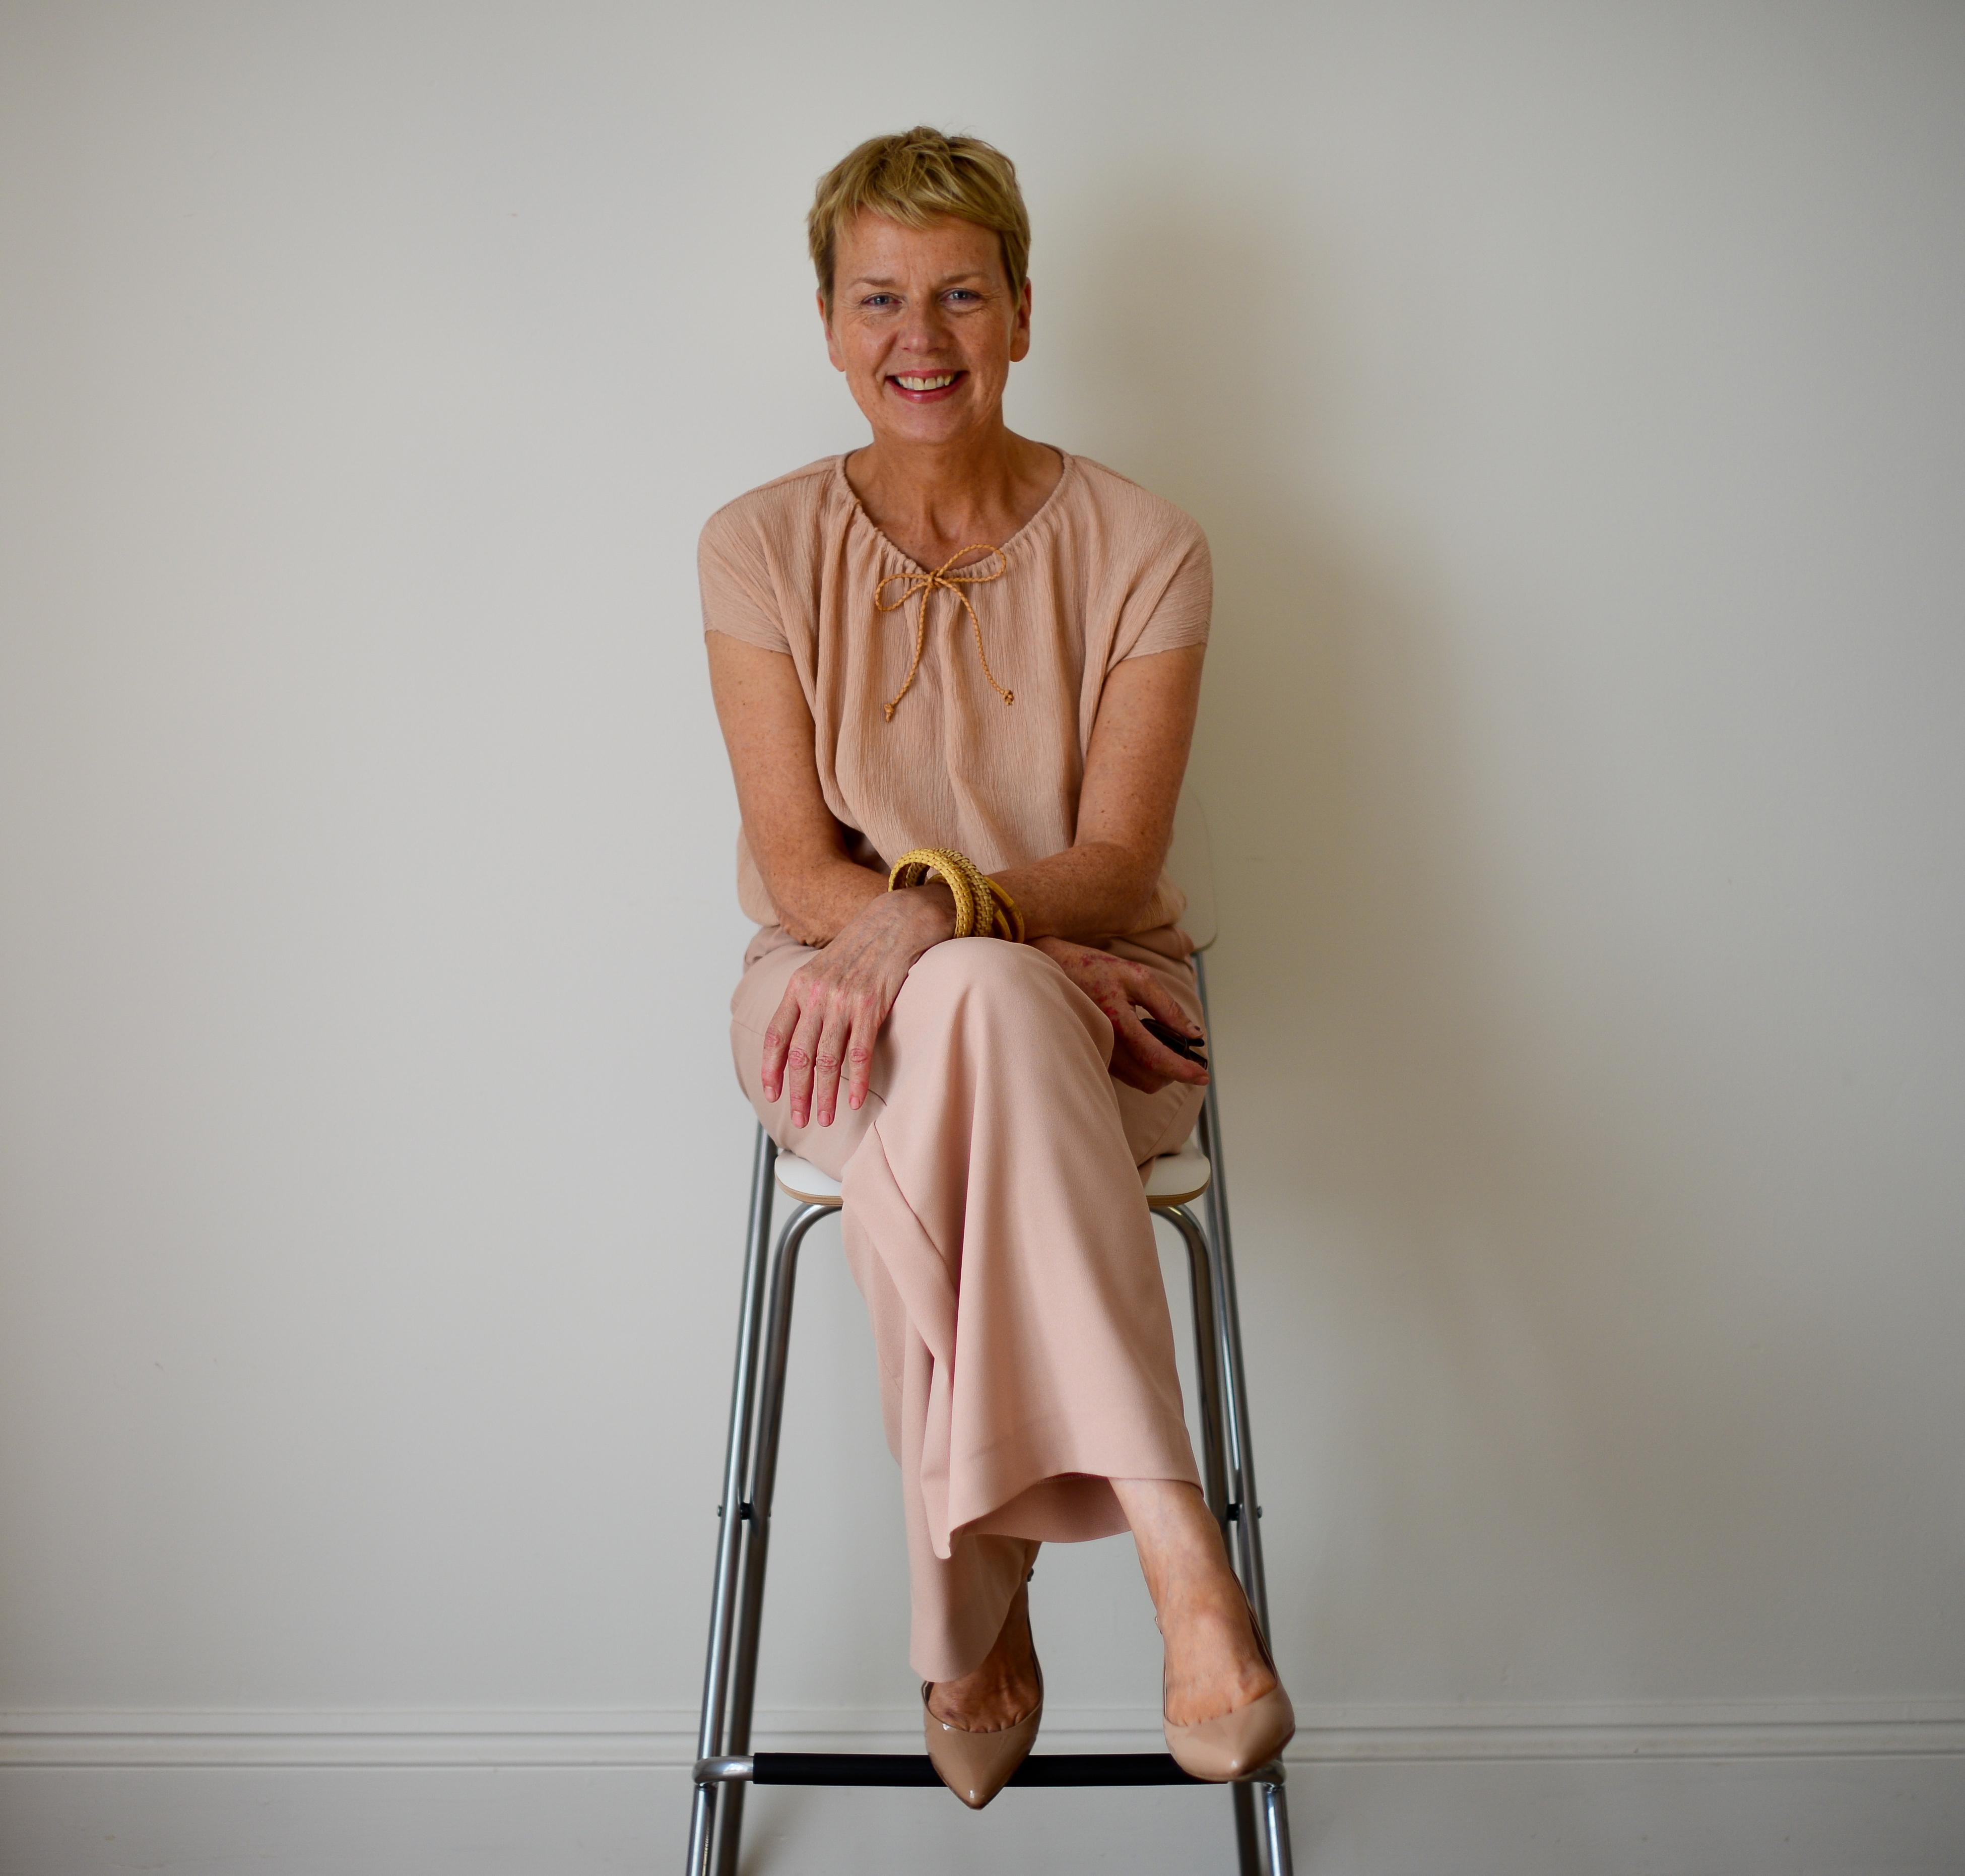 Frances Tobin TMA Profile